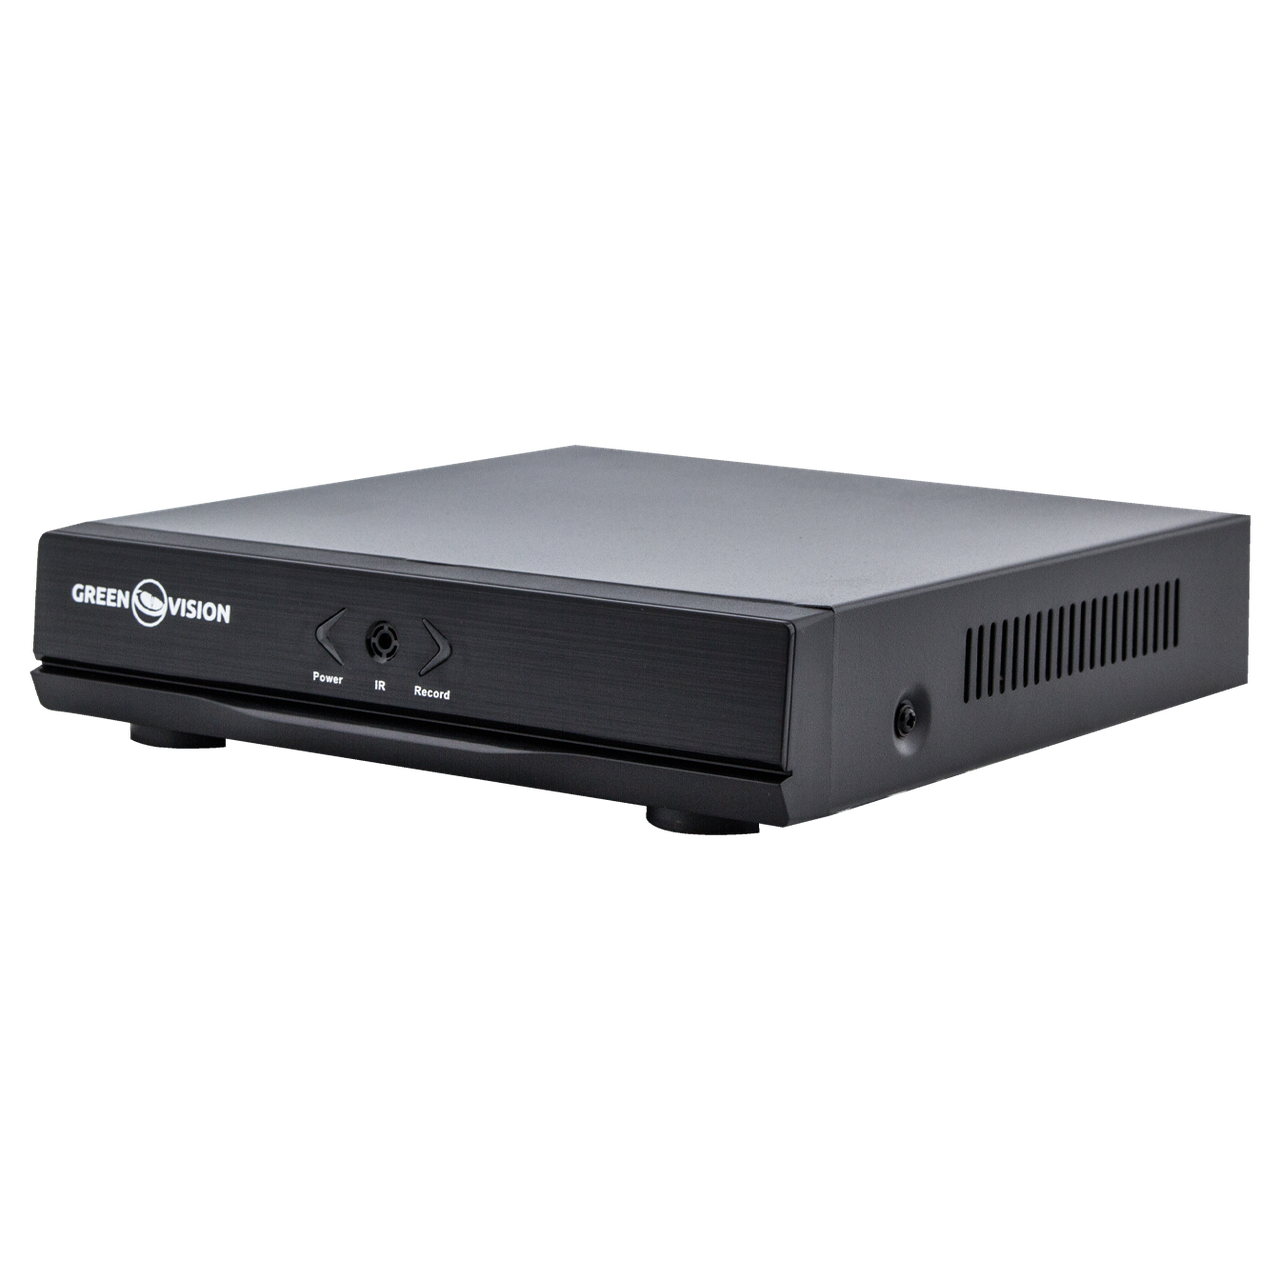 УЦ 4614 Гибридный видеорегистратор AHD Green Vision GV-A-S032/04 ** 1080N